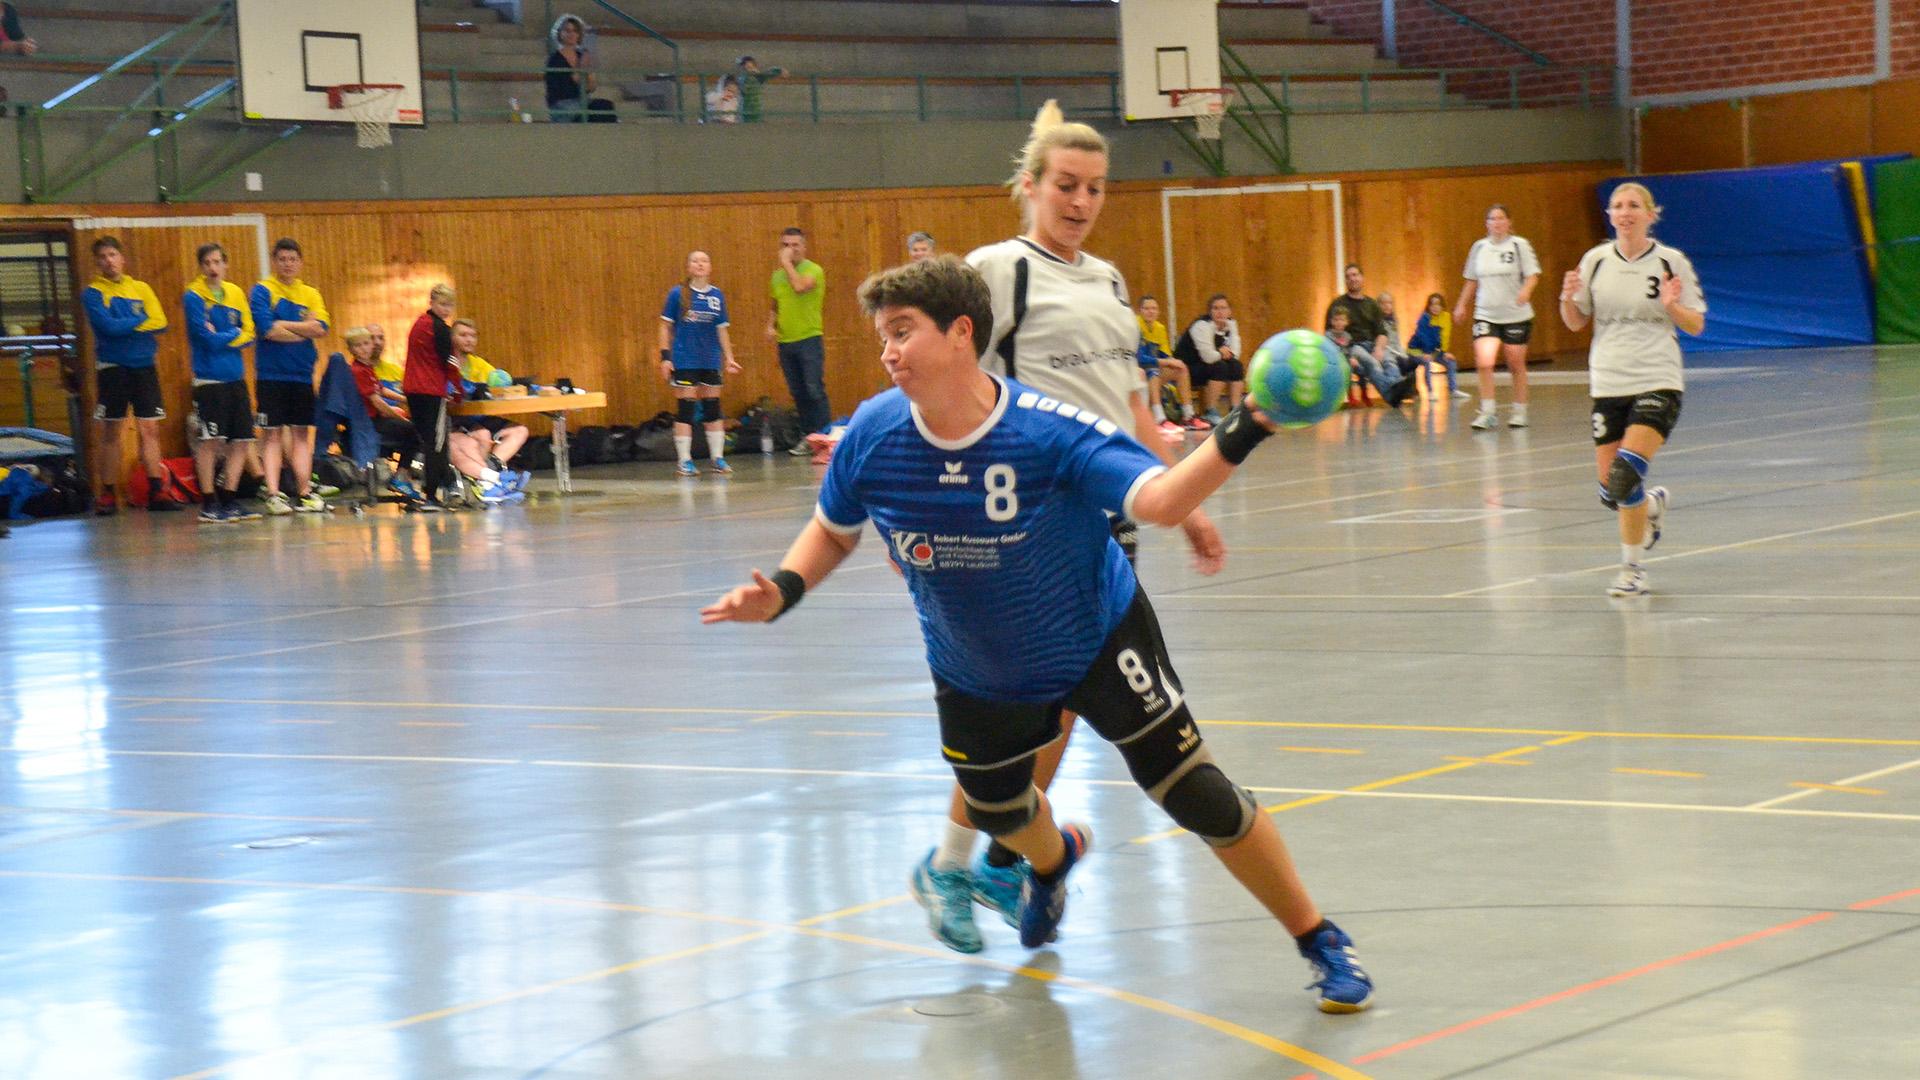 044Slider_F30_tsg_leutkirch_handball